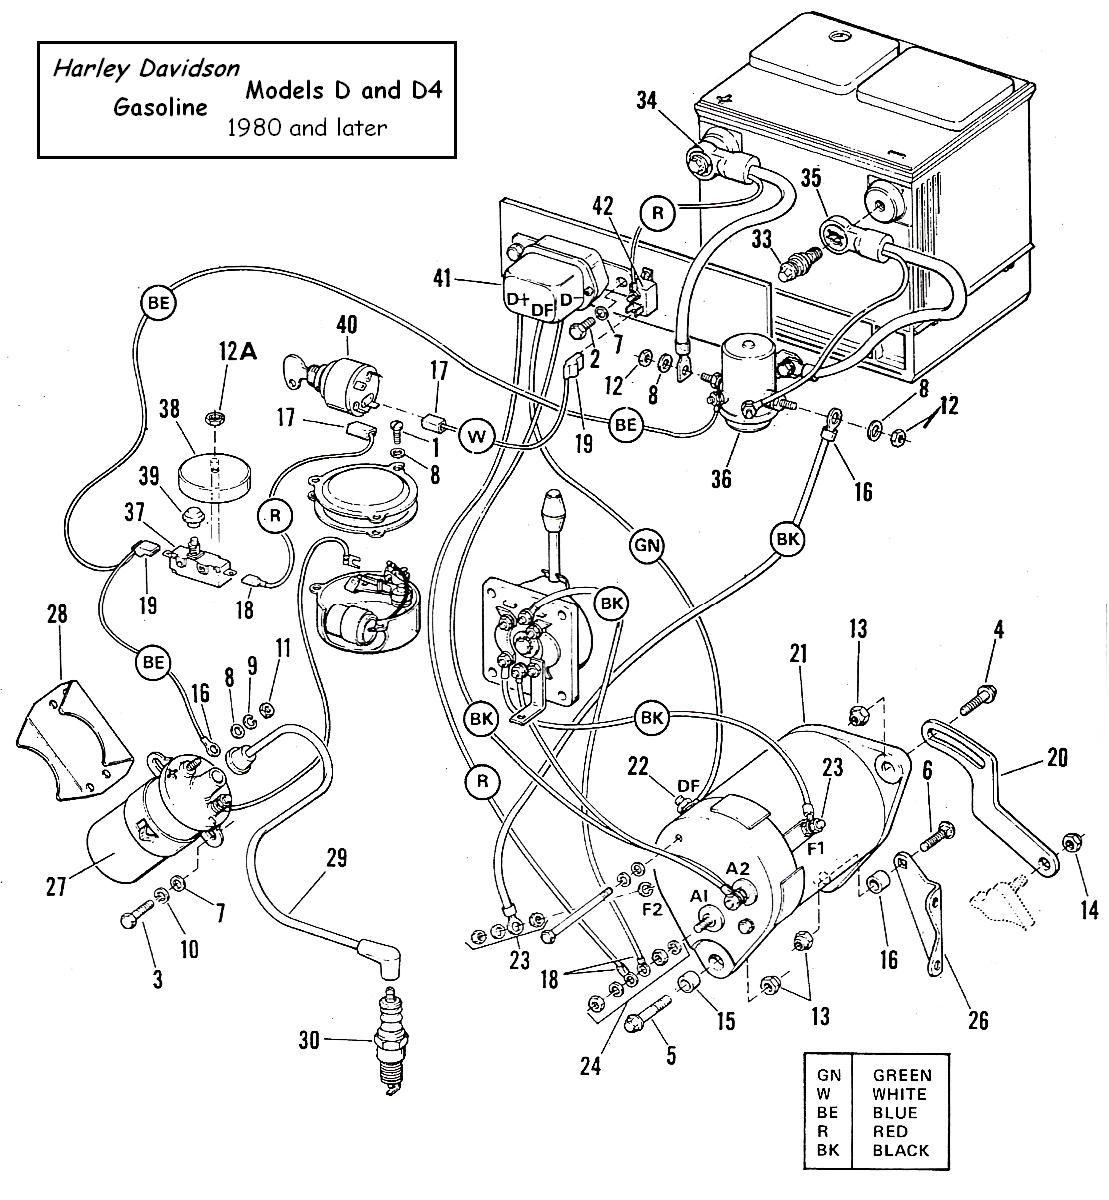 harley davidson golf cart d4 wiring diagram wiring diagrams my